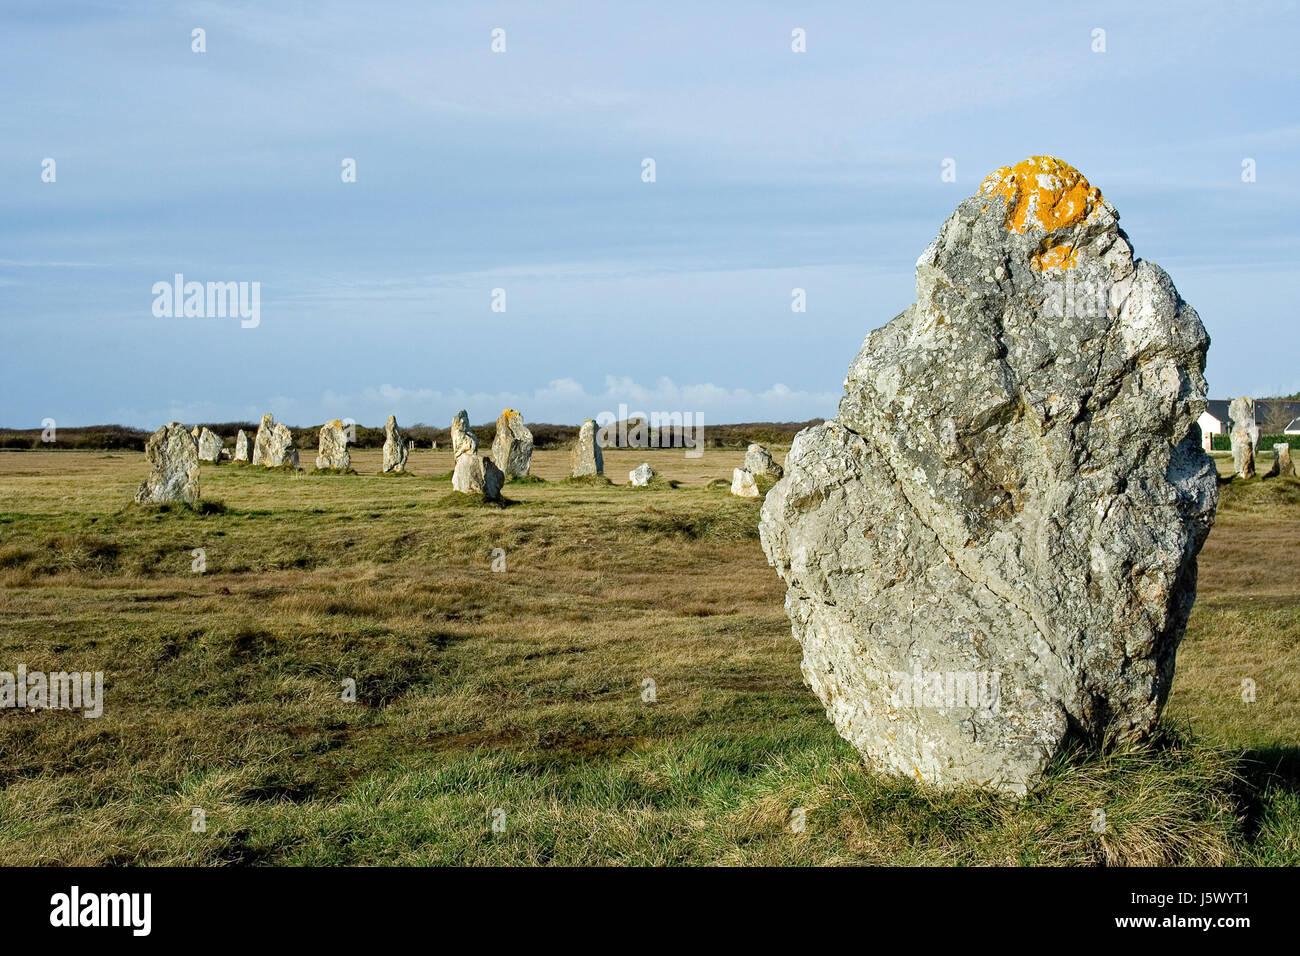 stone rock france prehistory monument stone rock france archeology prehistory - Stock Image